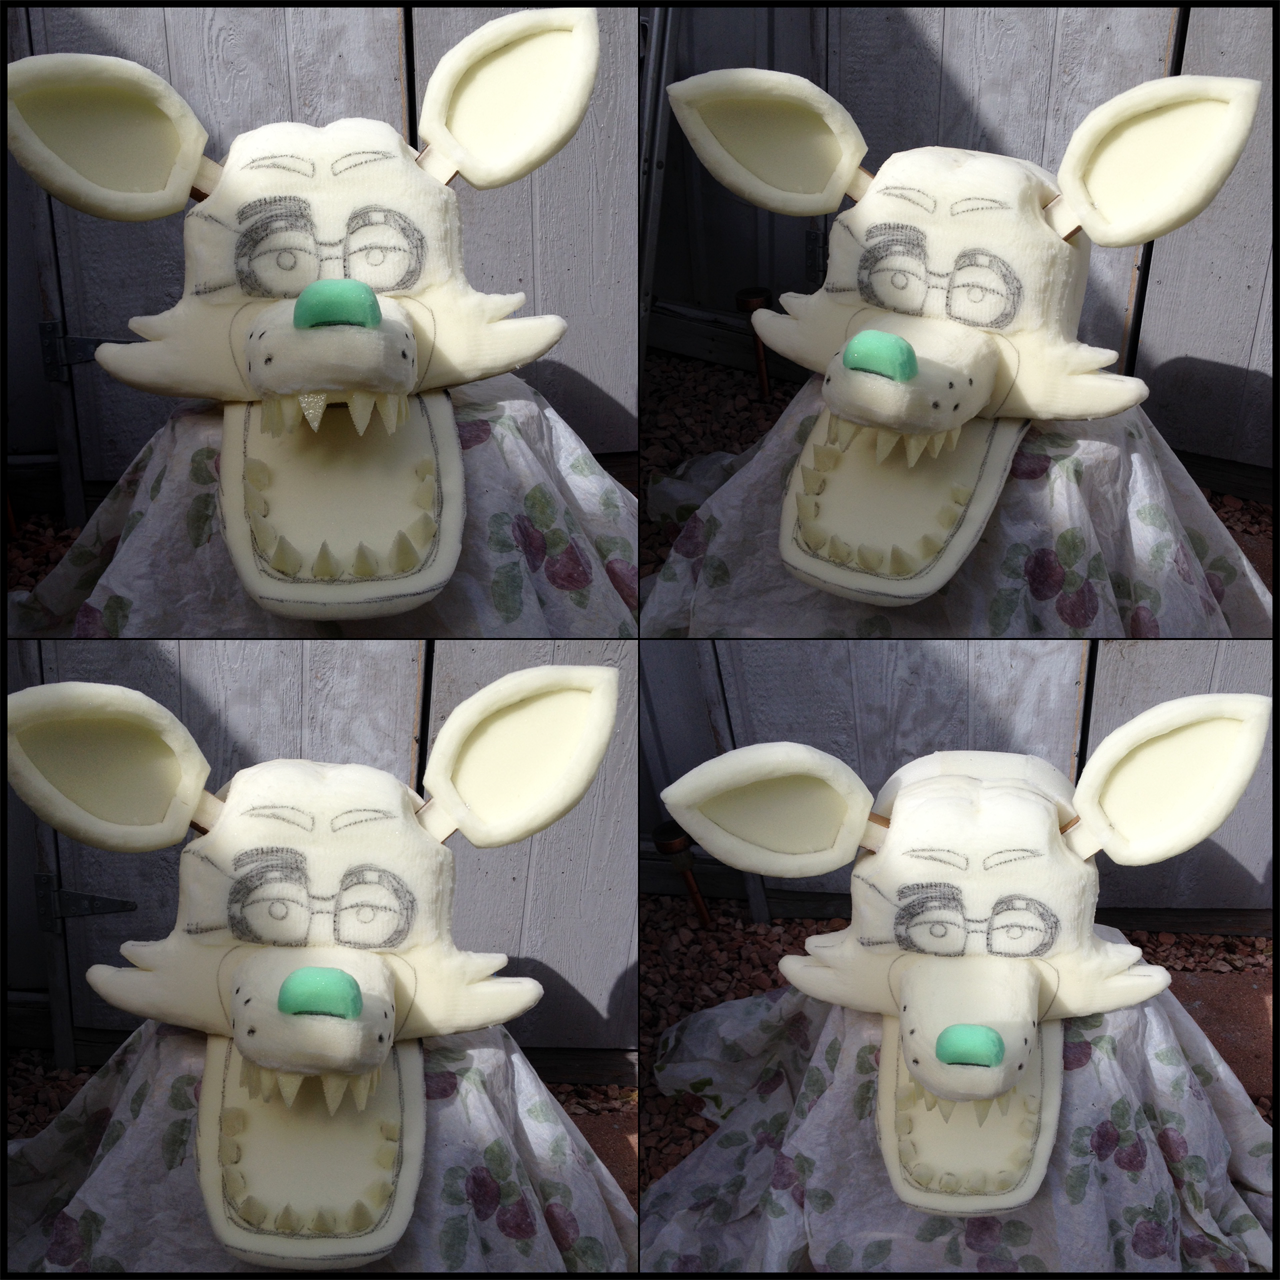 Fnaf bonnie costume for sale - Thisaccountisdead462 415 140 Foxy Head Base By Cavity Sam